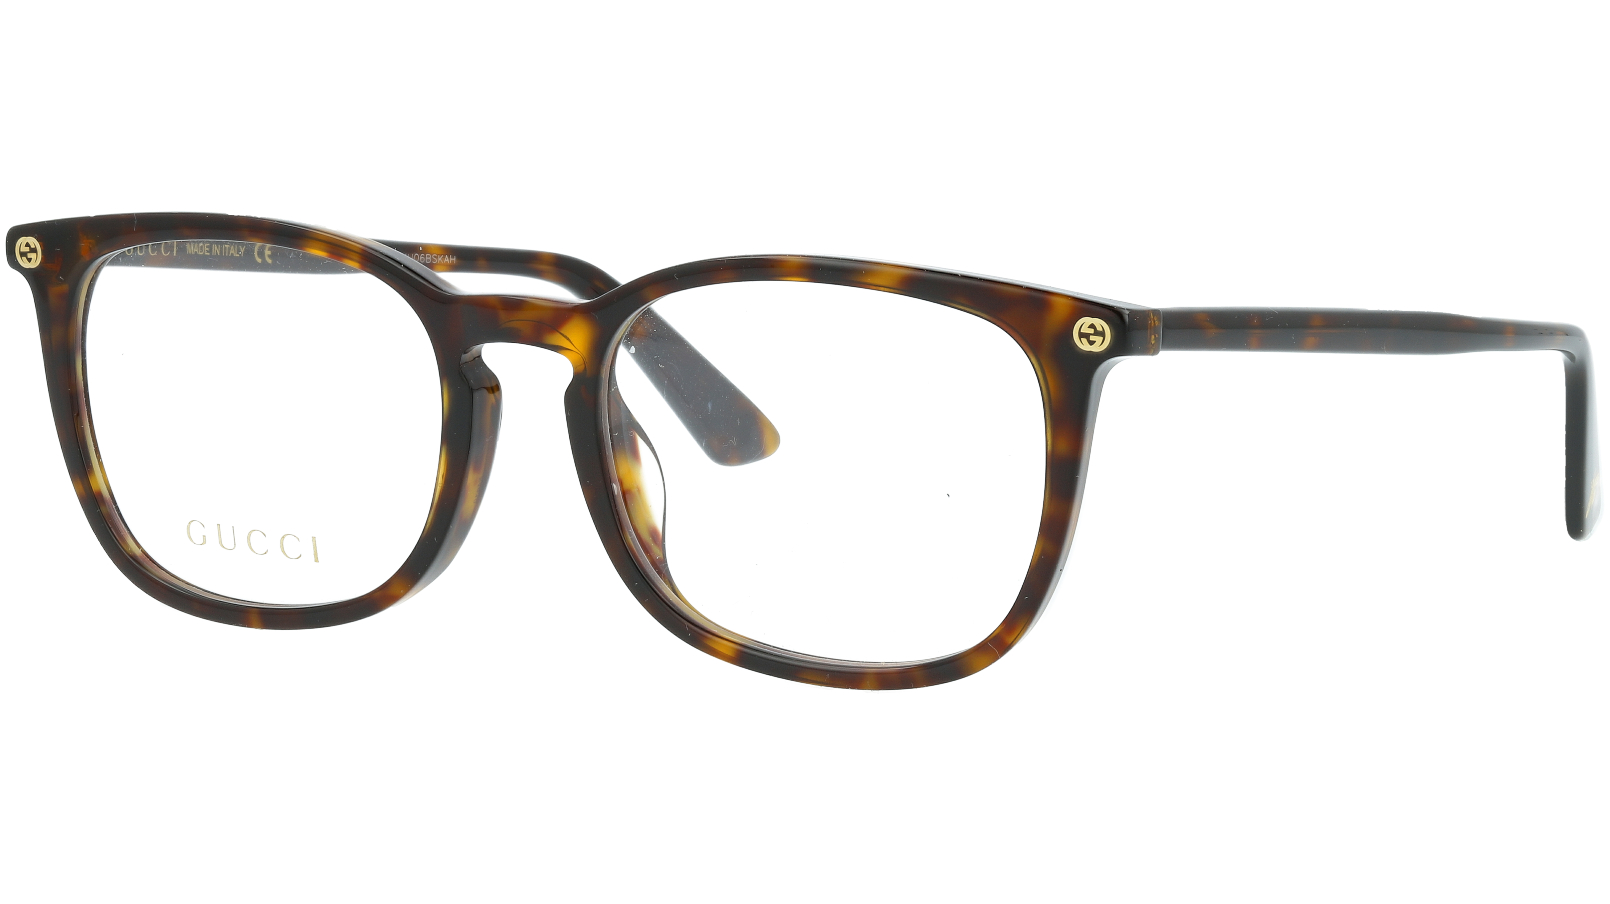 GUCCI GG0122OA 006 54 HAVANA Glasses